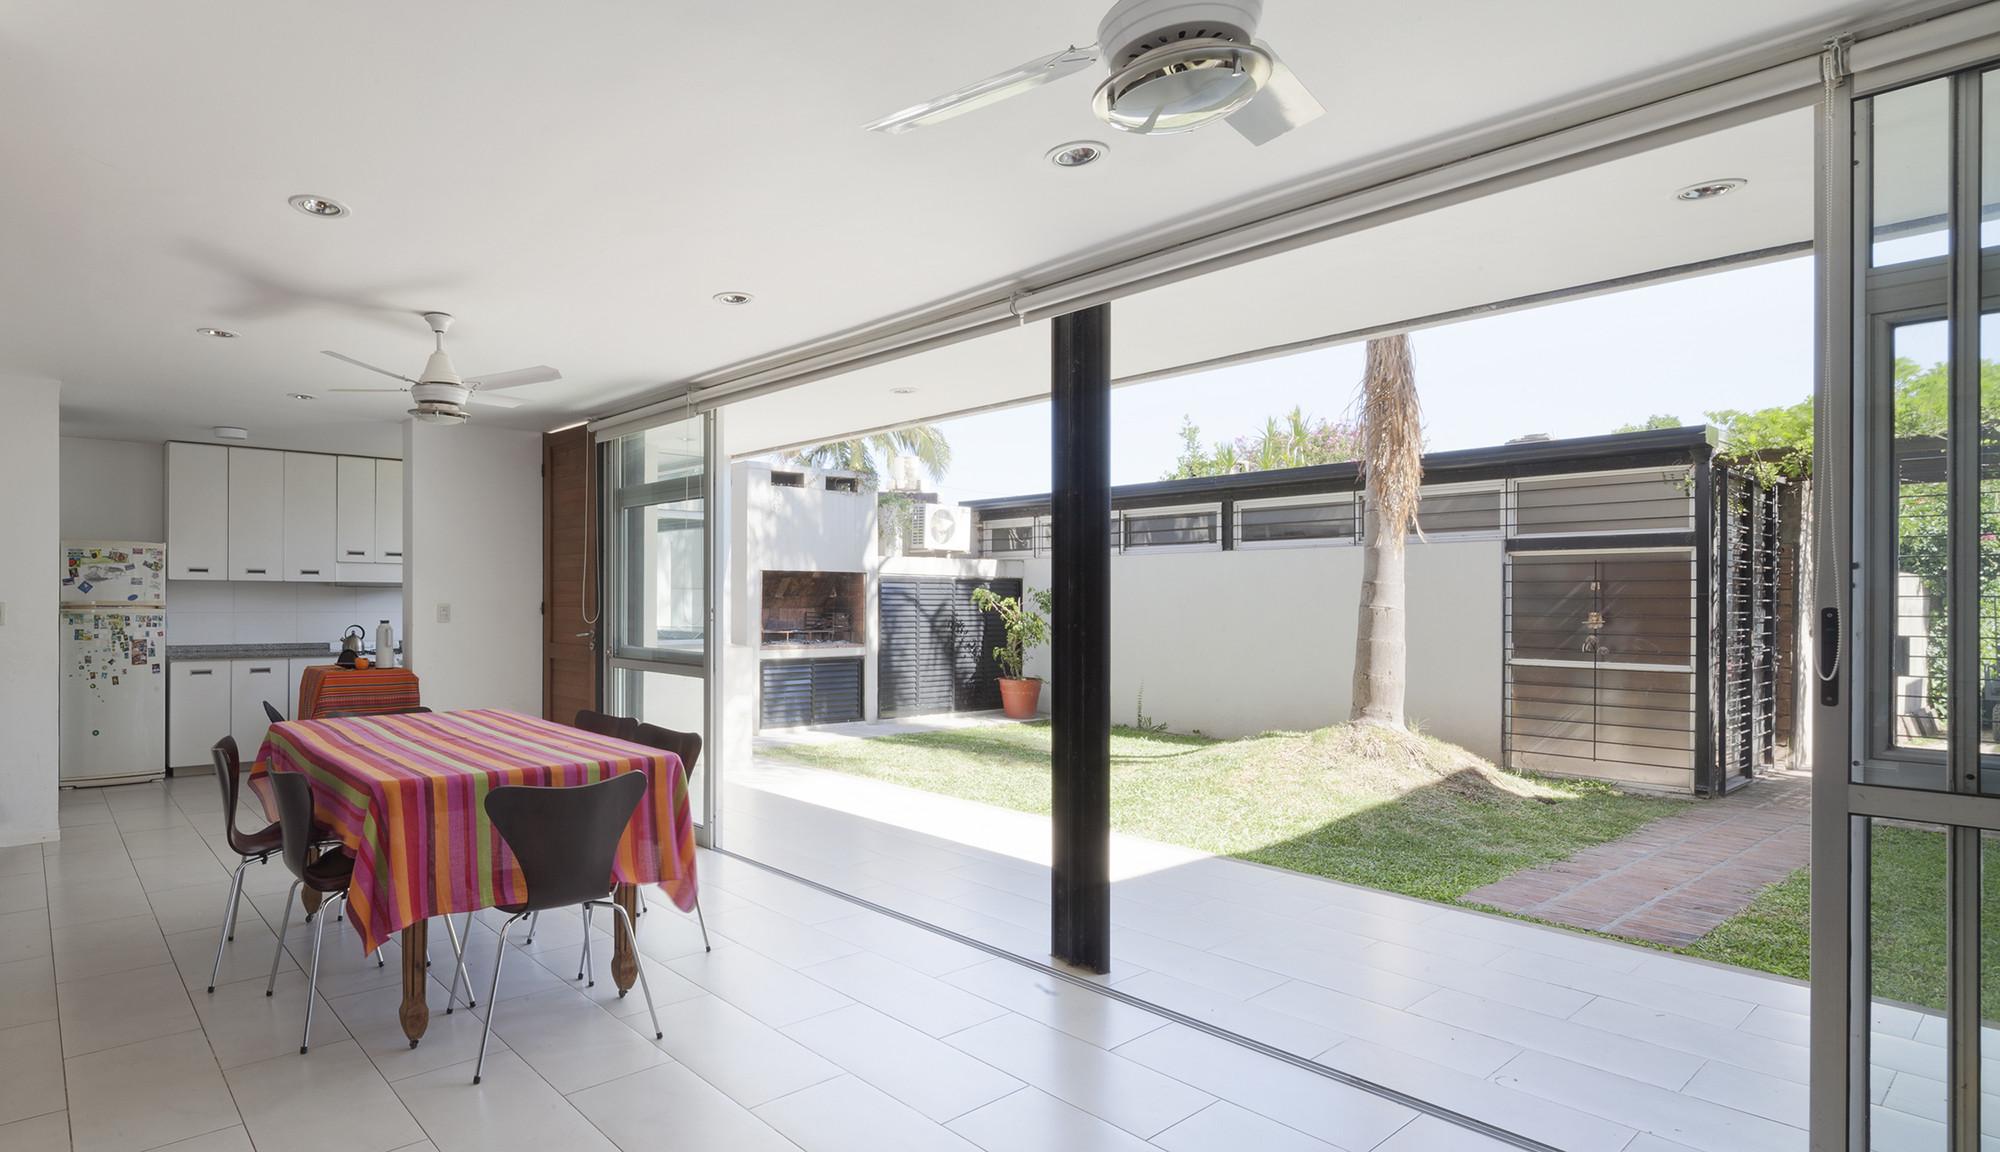 Galeria de casa interior rosana sdrigotti julio cavallo 22 - Casa interior ...